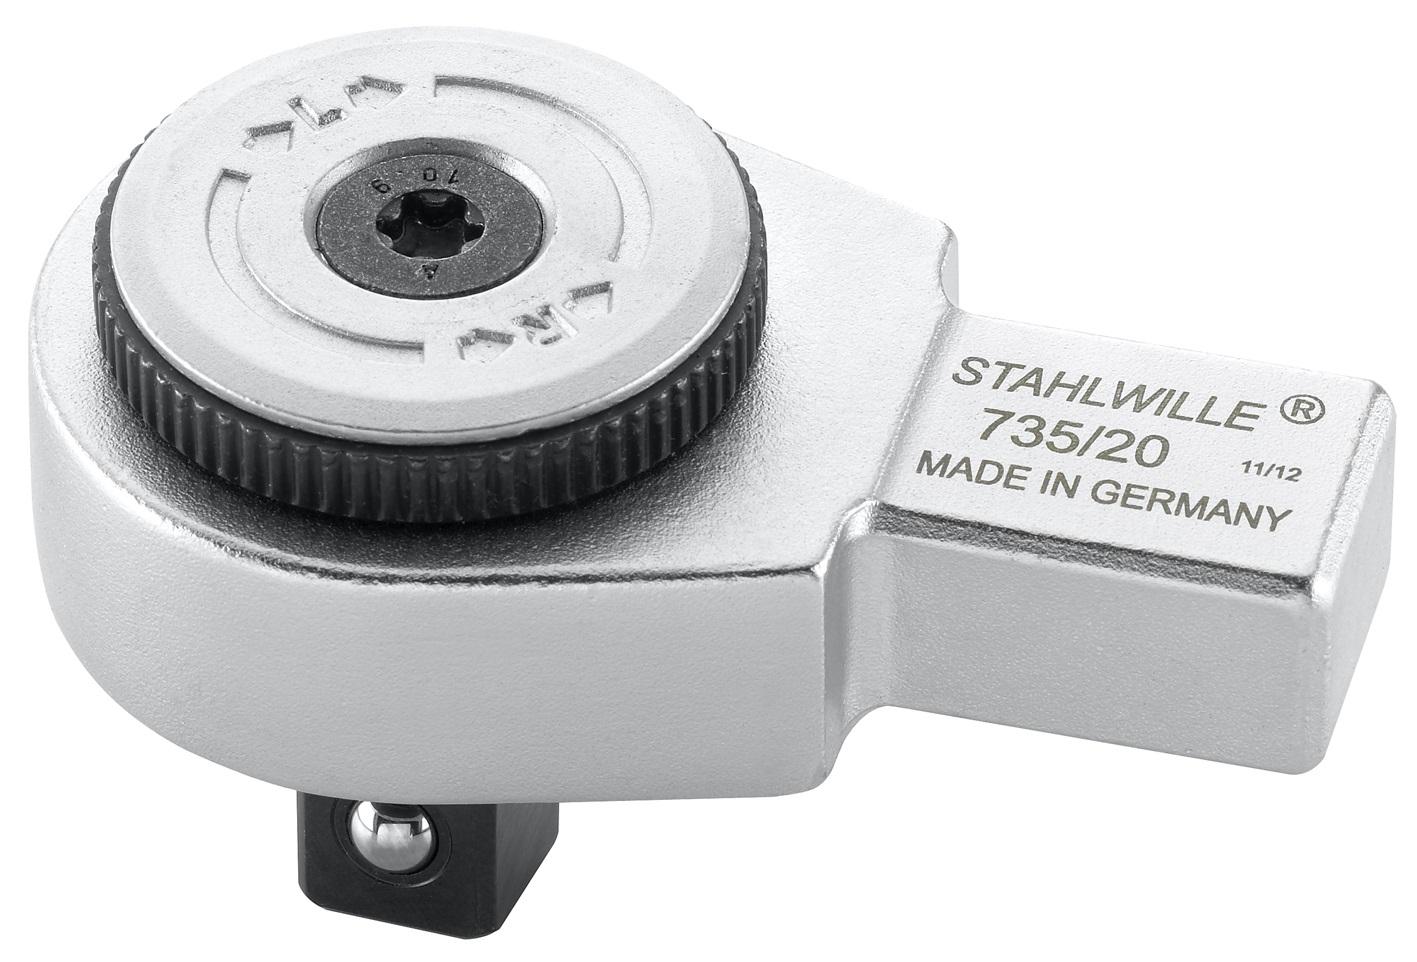 SW 735/20